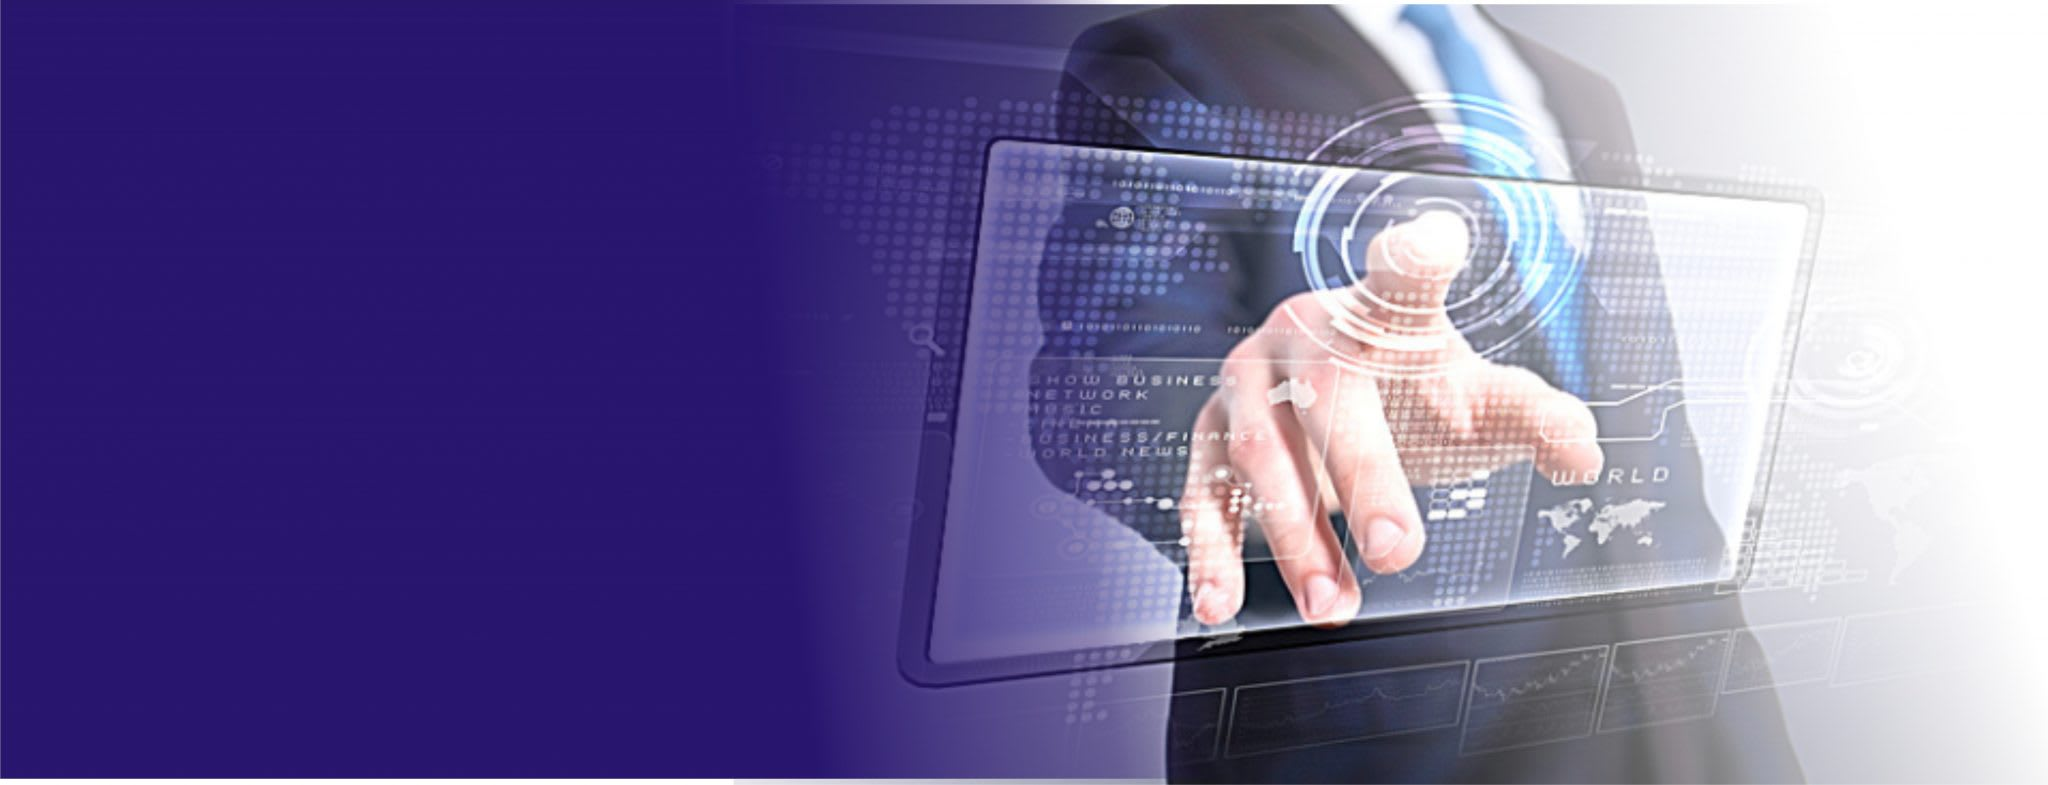 bizmarrow Computer training school abuja